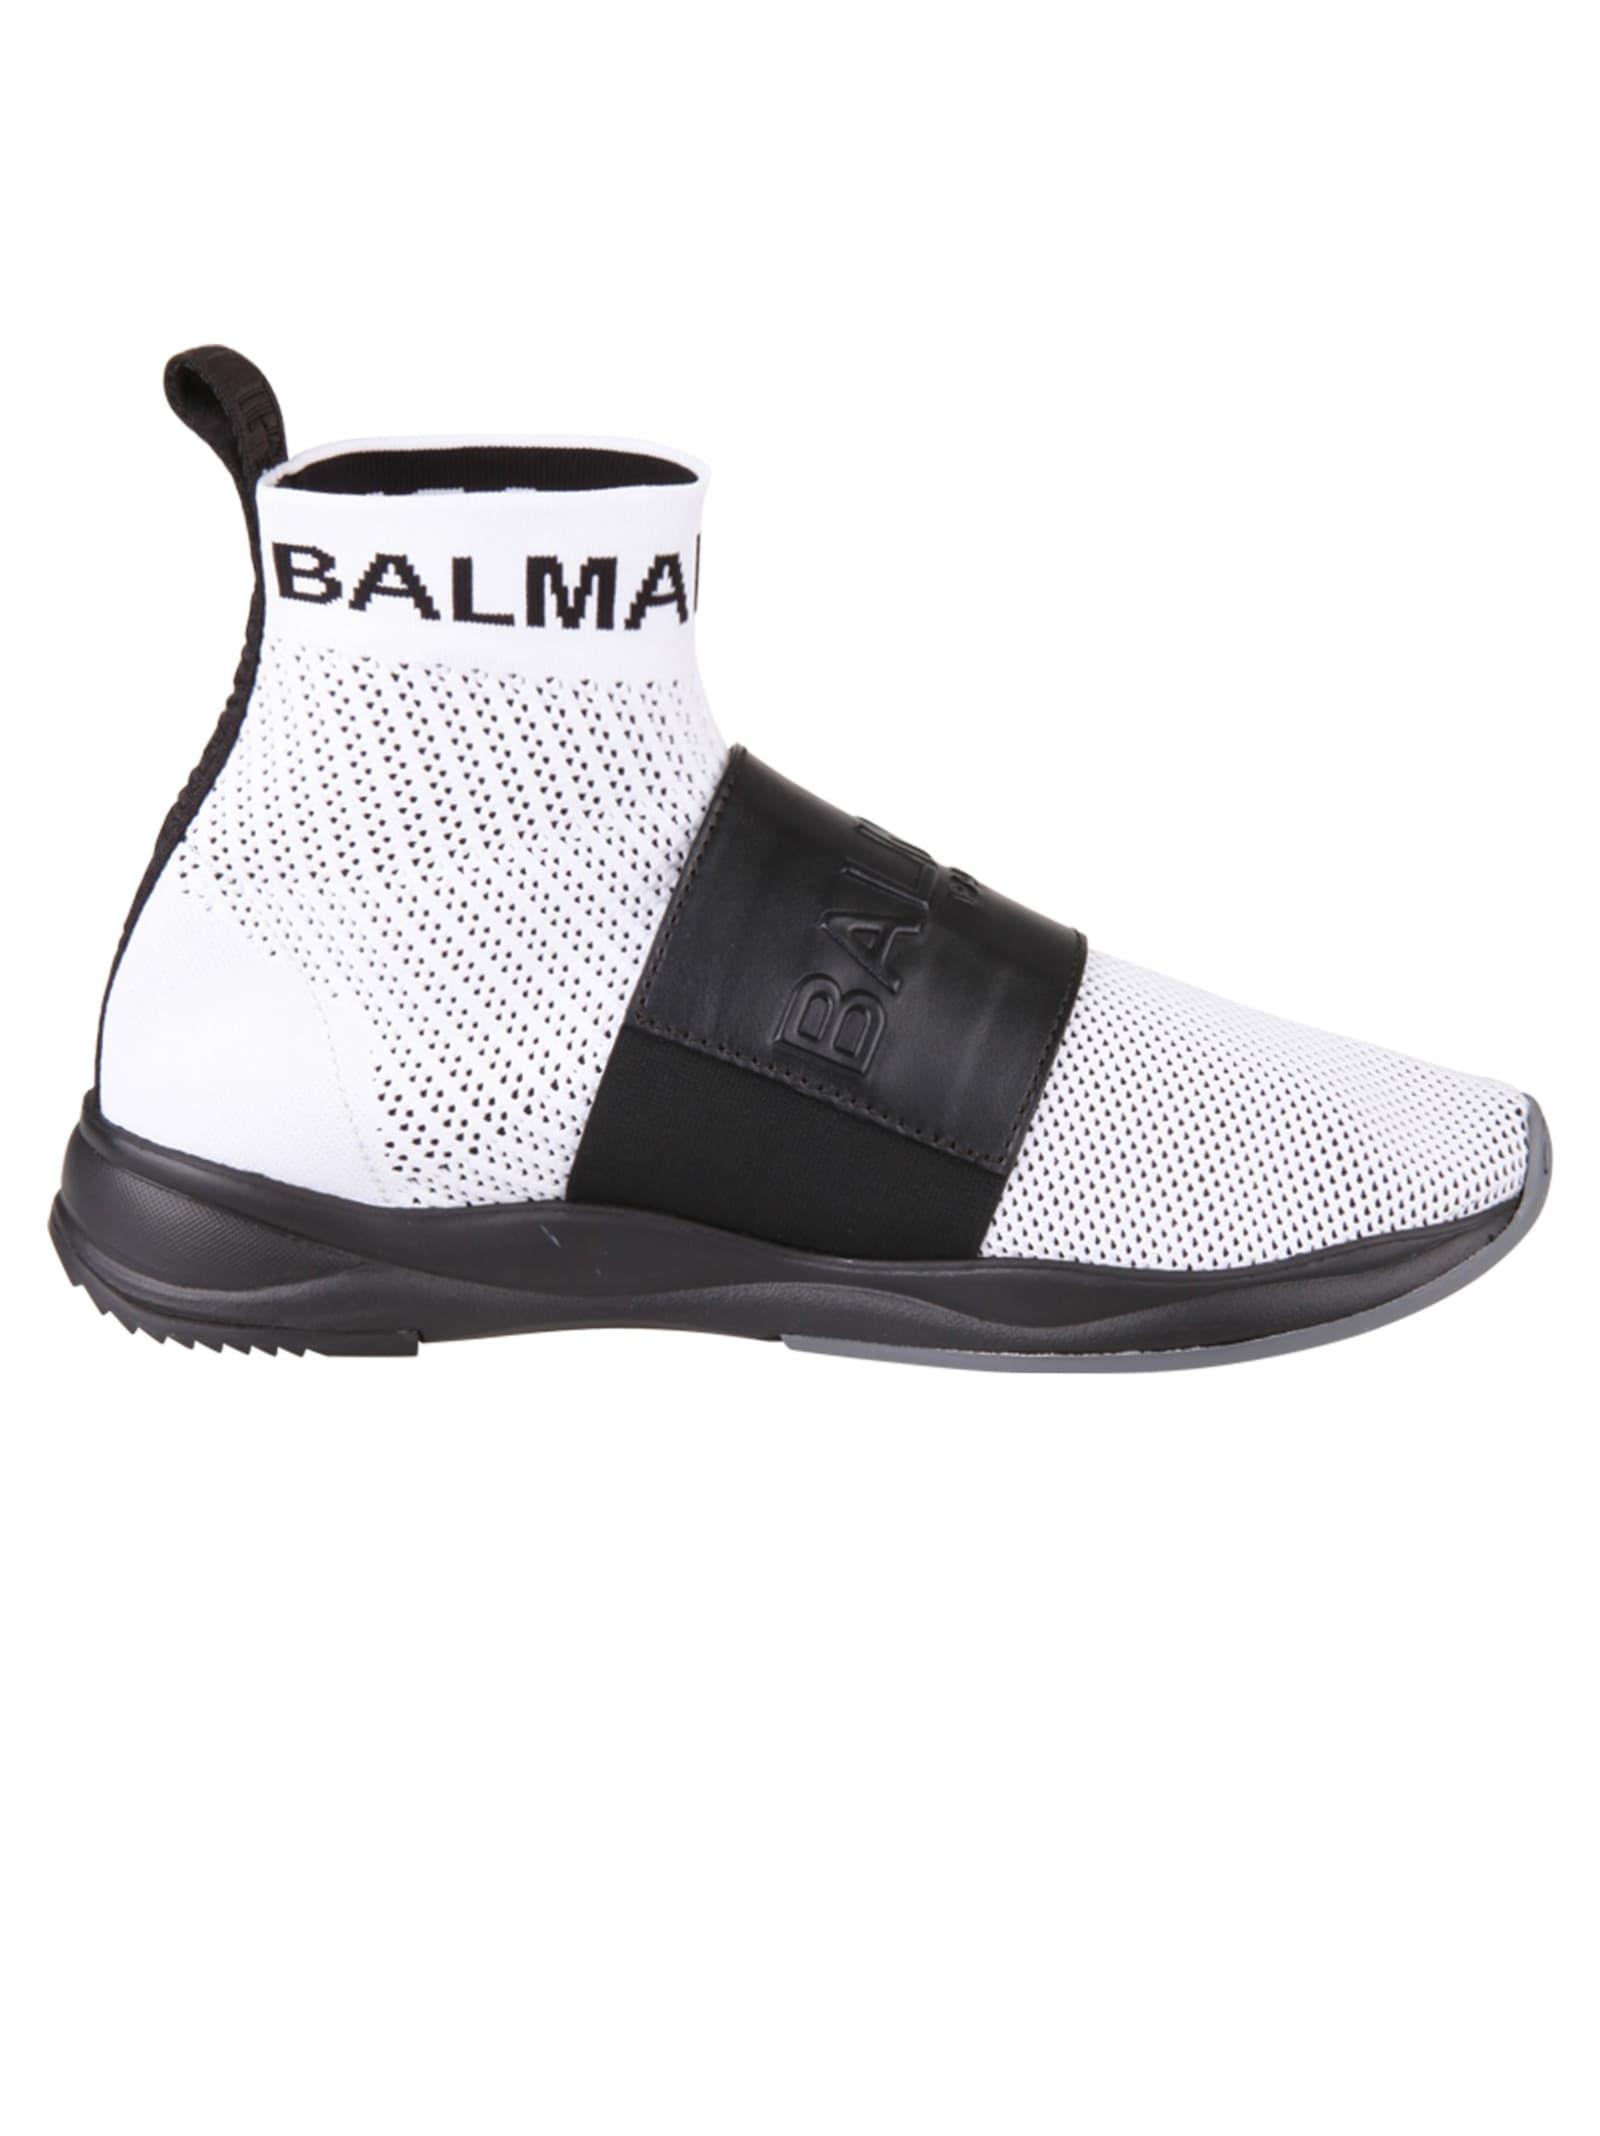 Balmain Balmain Paris Sneakers White 10796747 Italist